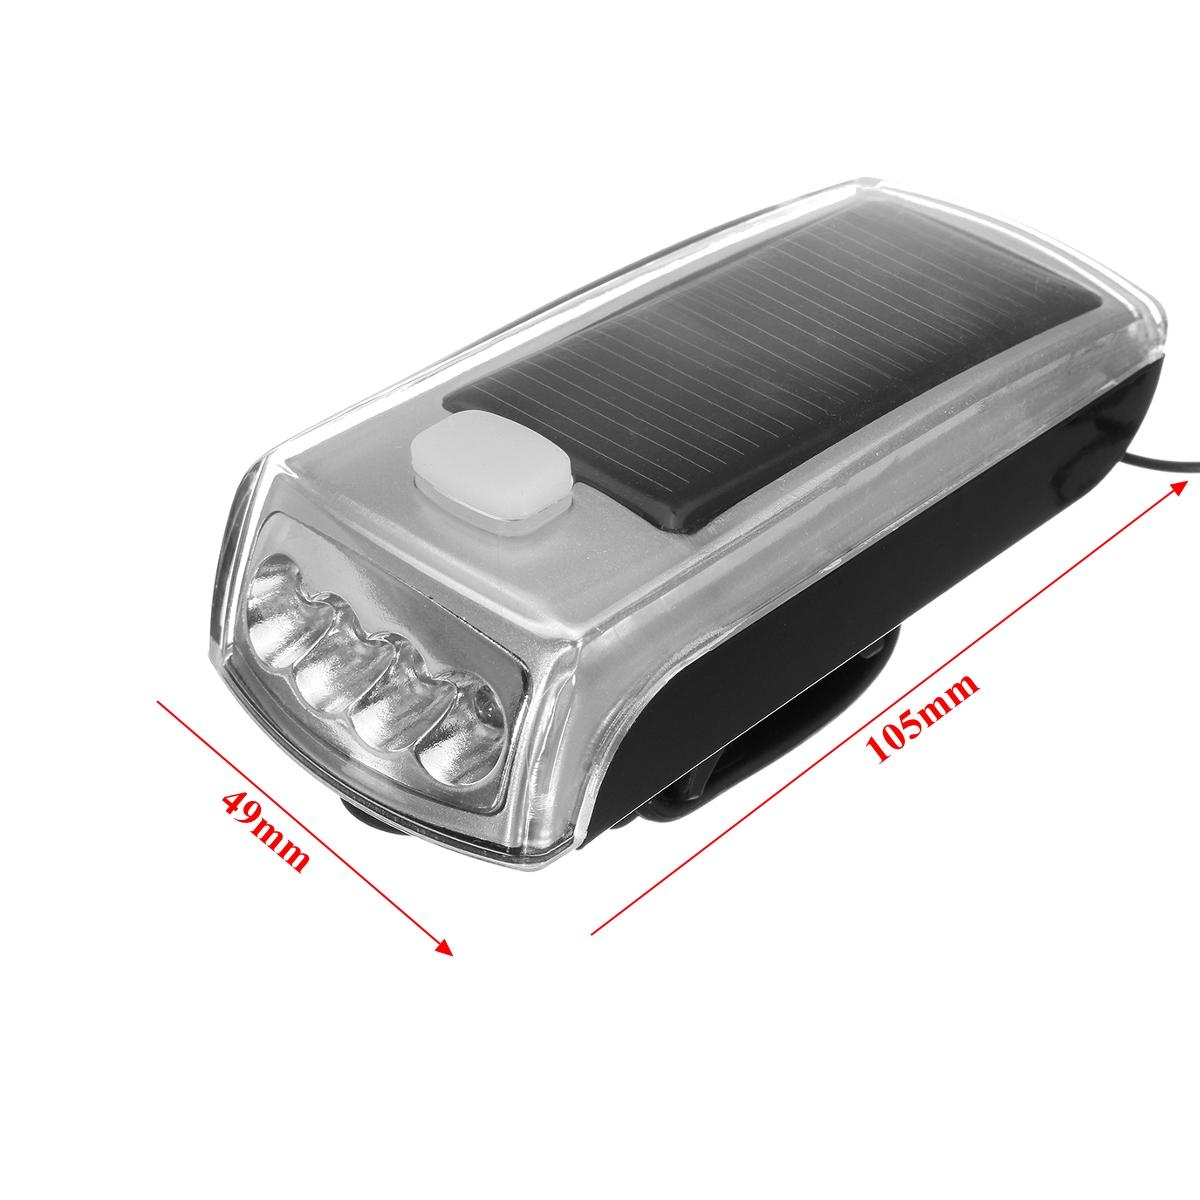 BIKIGHT 4 LED 1200LM USB Rechargeable Solar Bicycle Light Headlight Speaker